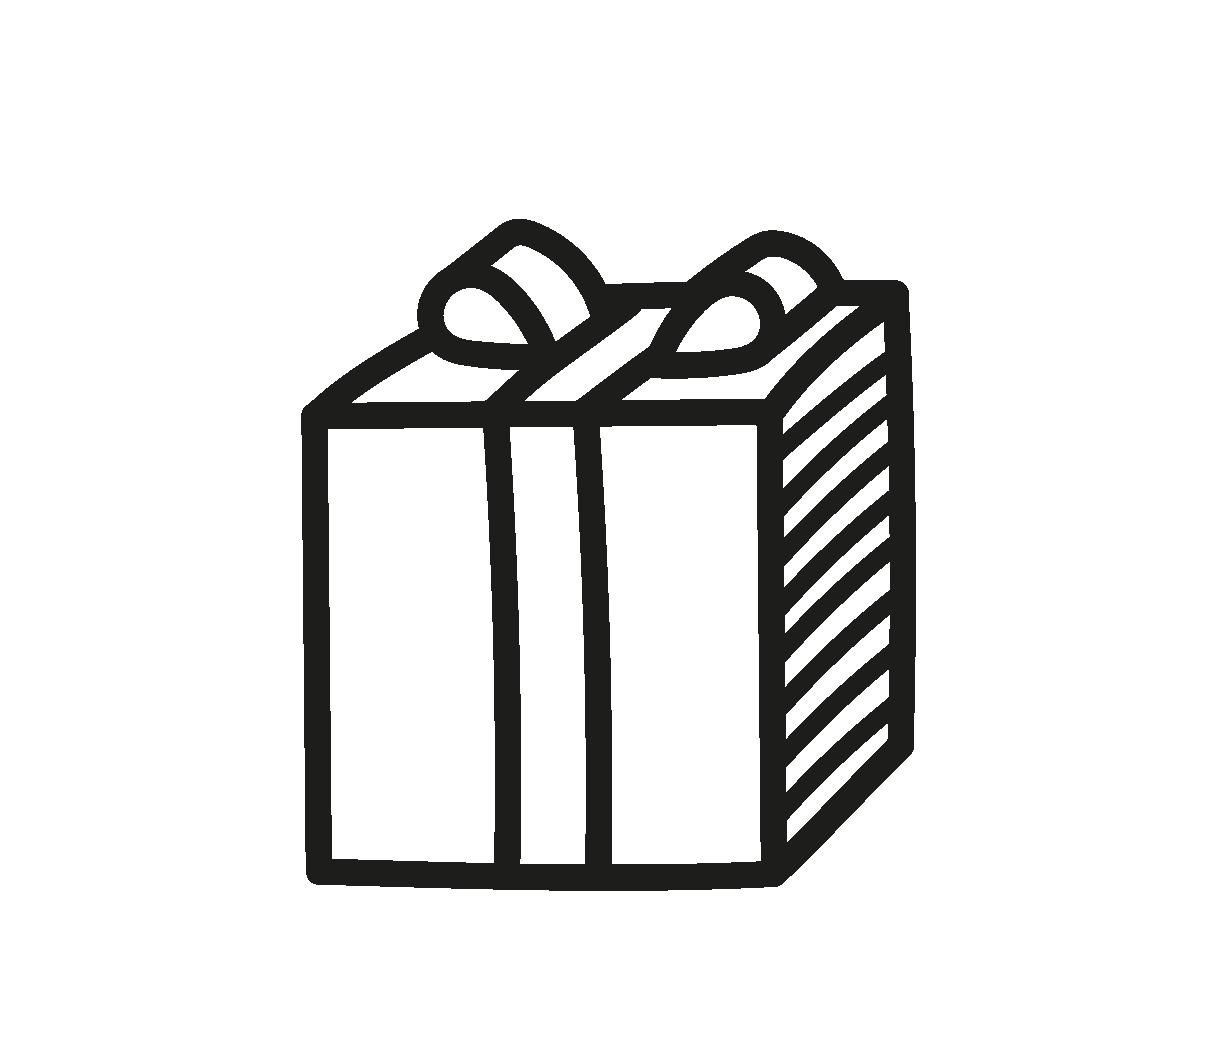 icon_gift_Artboard 7